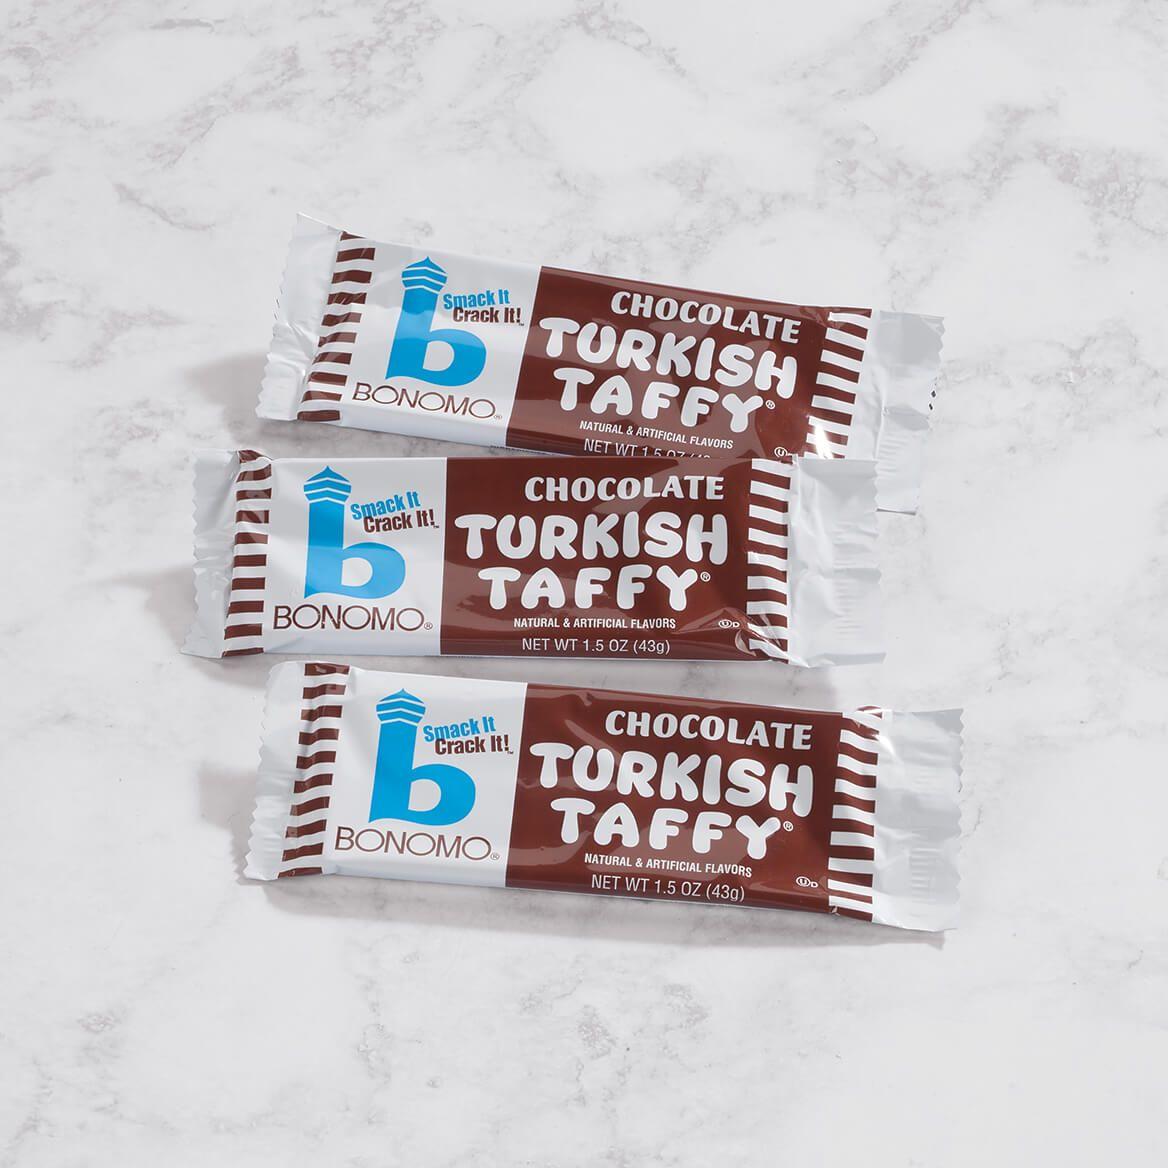 Bonomo Turkish Taffy, Chocolate, Set of 3-368941